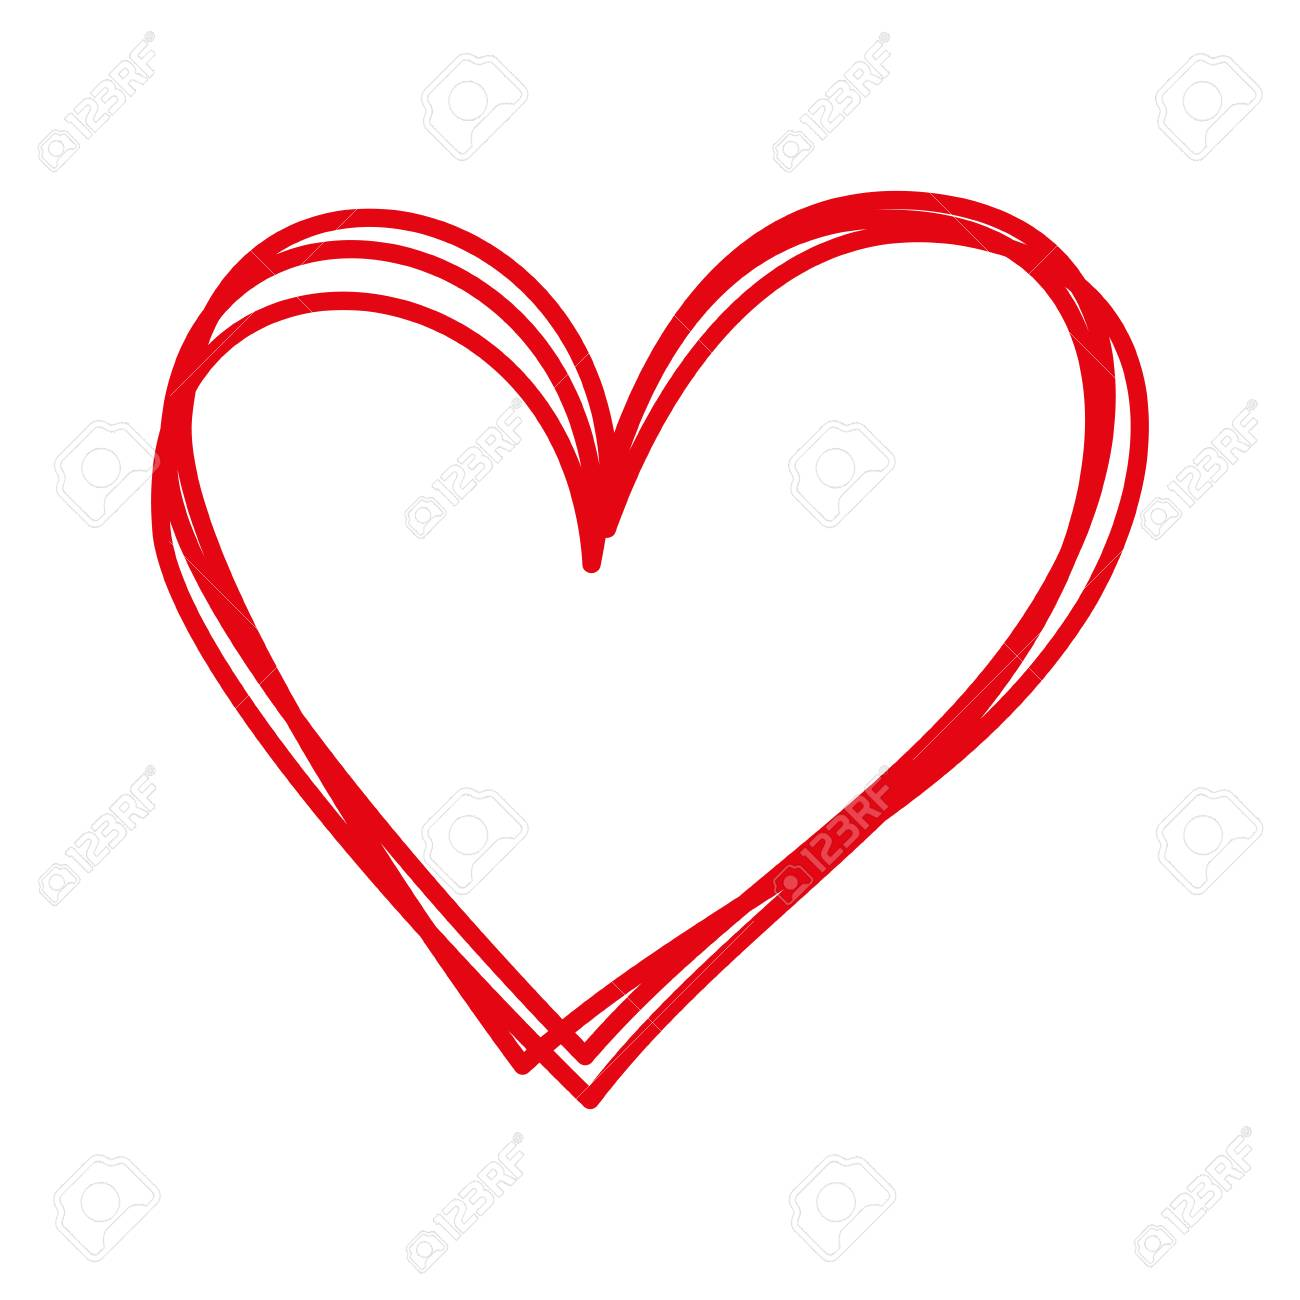 linear cartoon hand drawn heart doodle vector illustration - 88826873